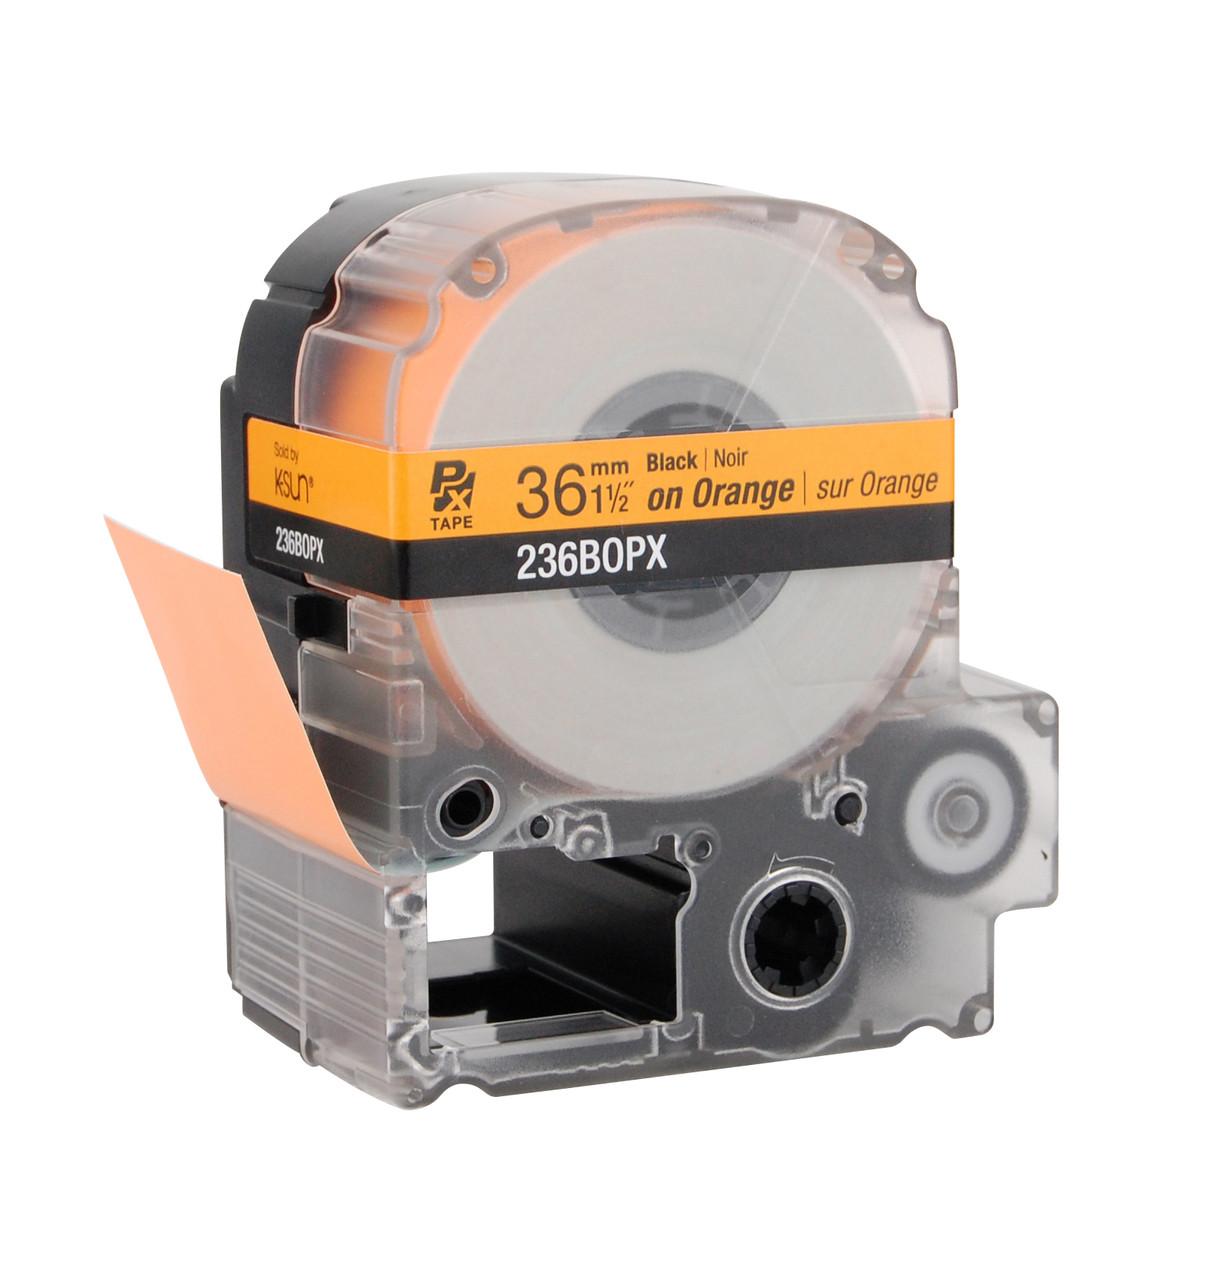 "Epson 236BOPX 1 1/2"" Orange Glossy Polyester Label PX Tape"